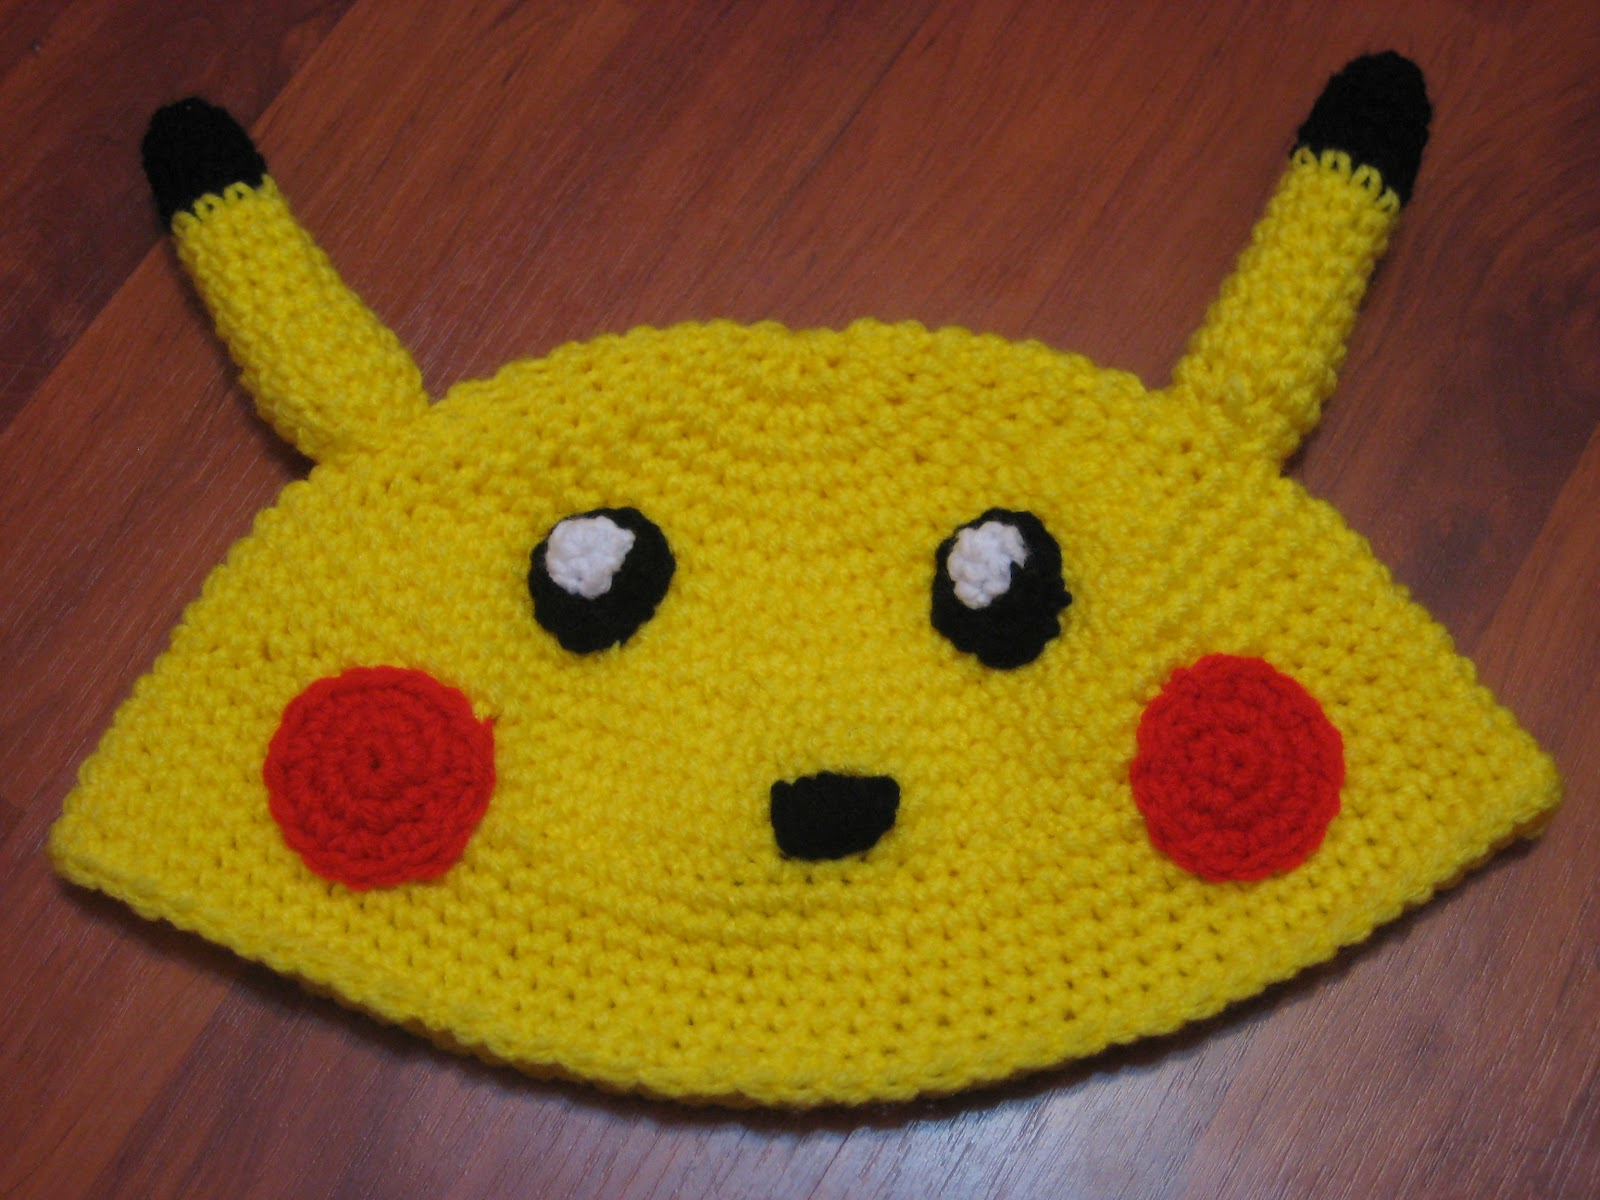 Crochet Warrior: Crochet